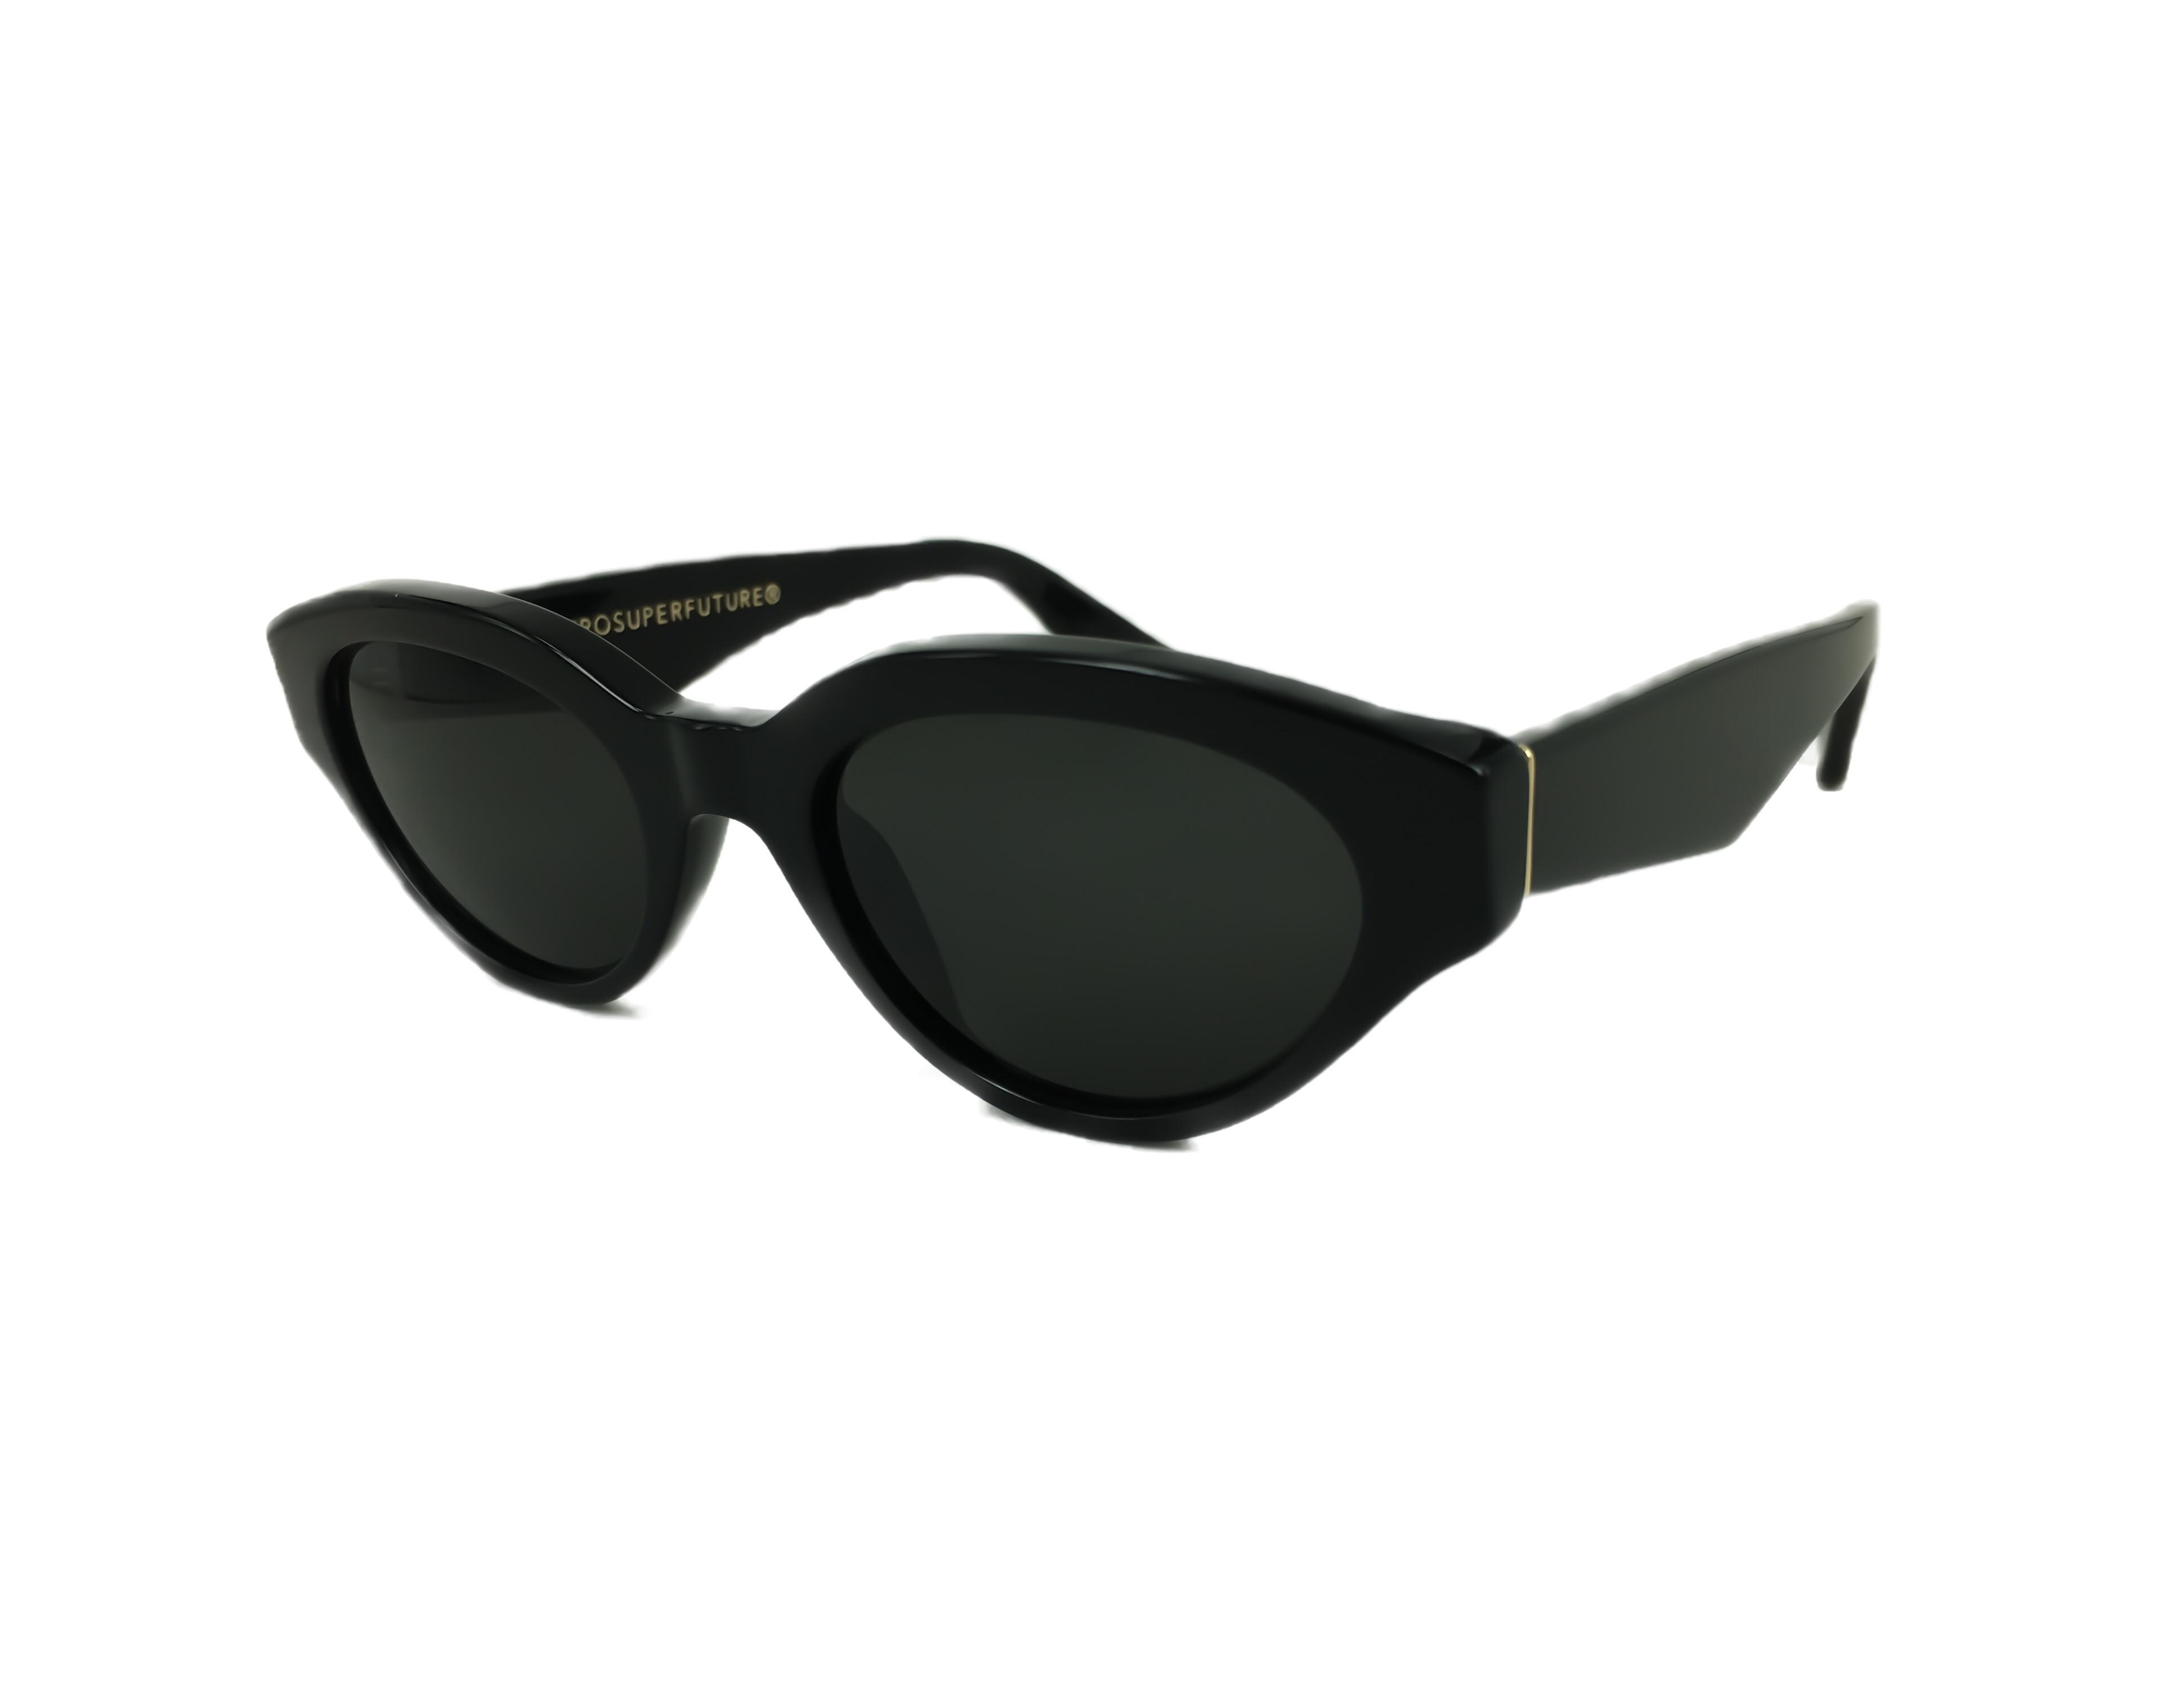 62e5067b99 SUPER DREW BLACK. SUPER DREW BLACK. Κωδικός  DREW BLACK. UNISEX γυαλιά ηλίου  της εταιρίας RETROSUPERFUTURE ...